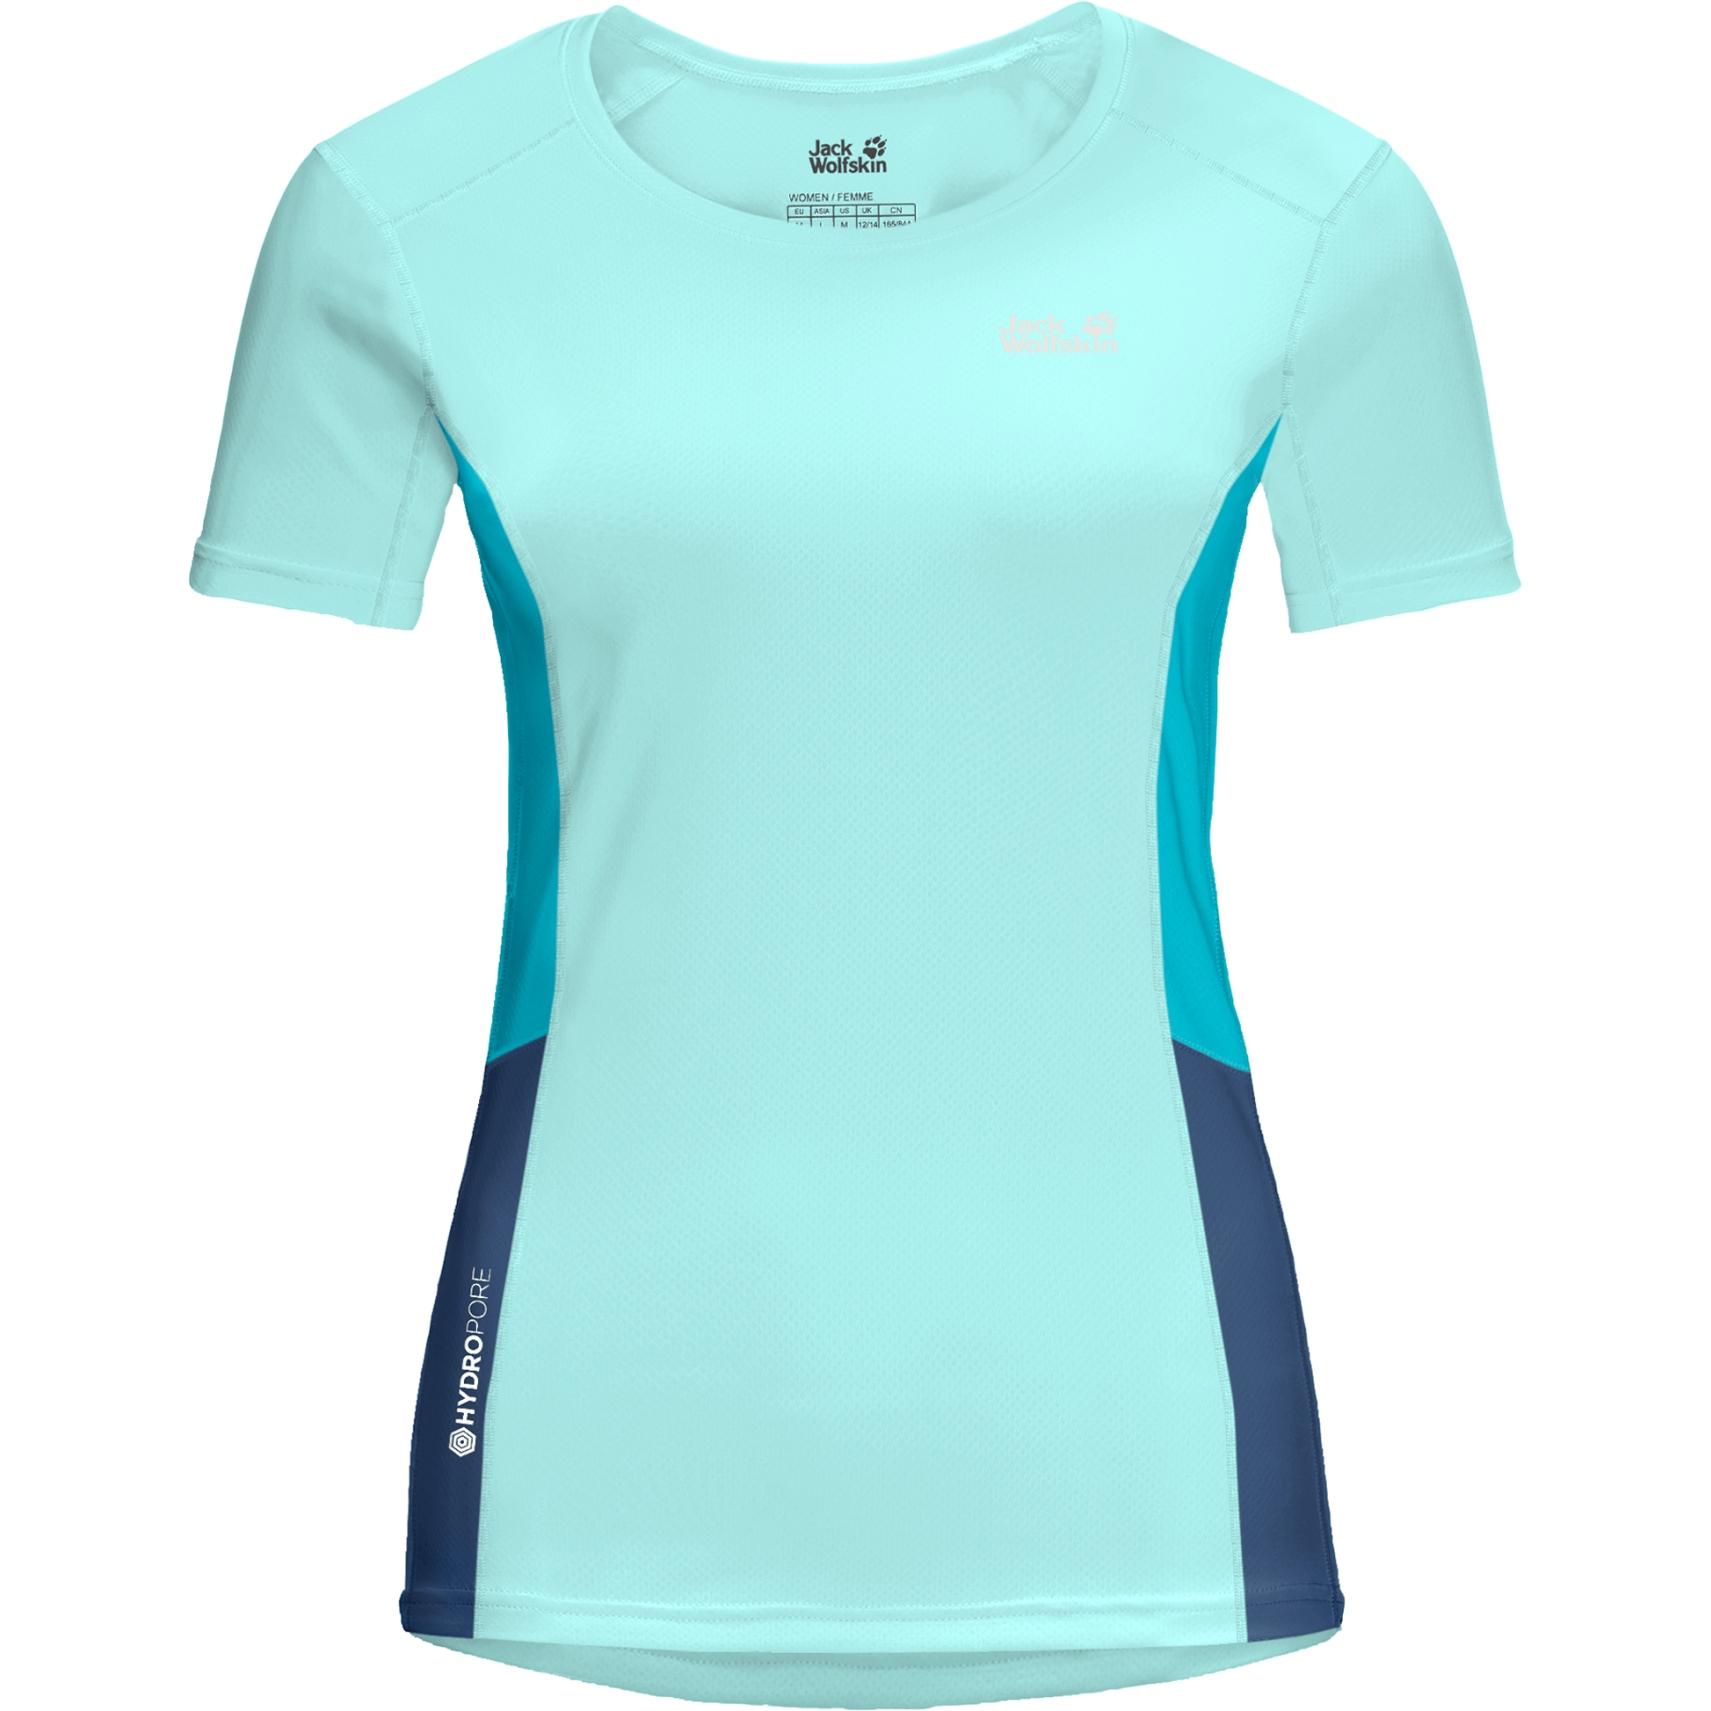 Jack Wolfskin Narrows Damen T-Shirt - powder blue